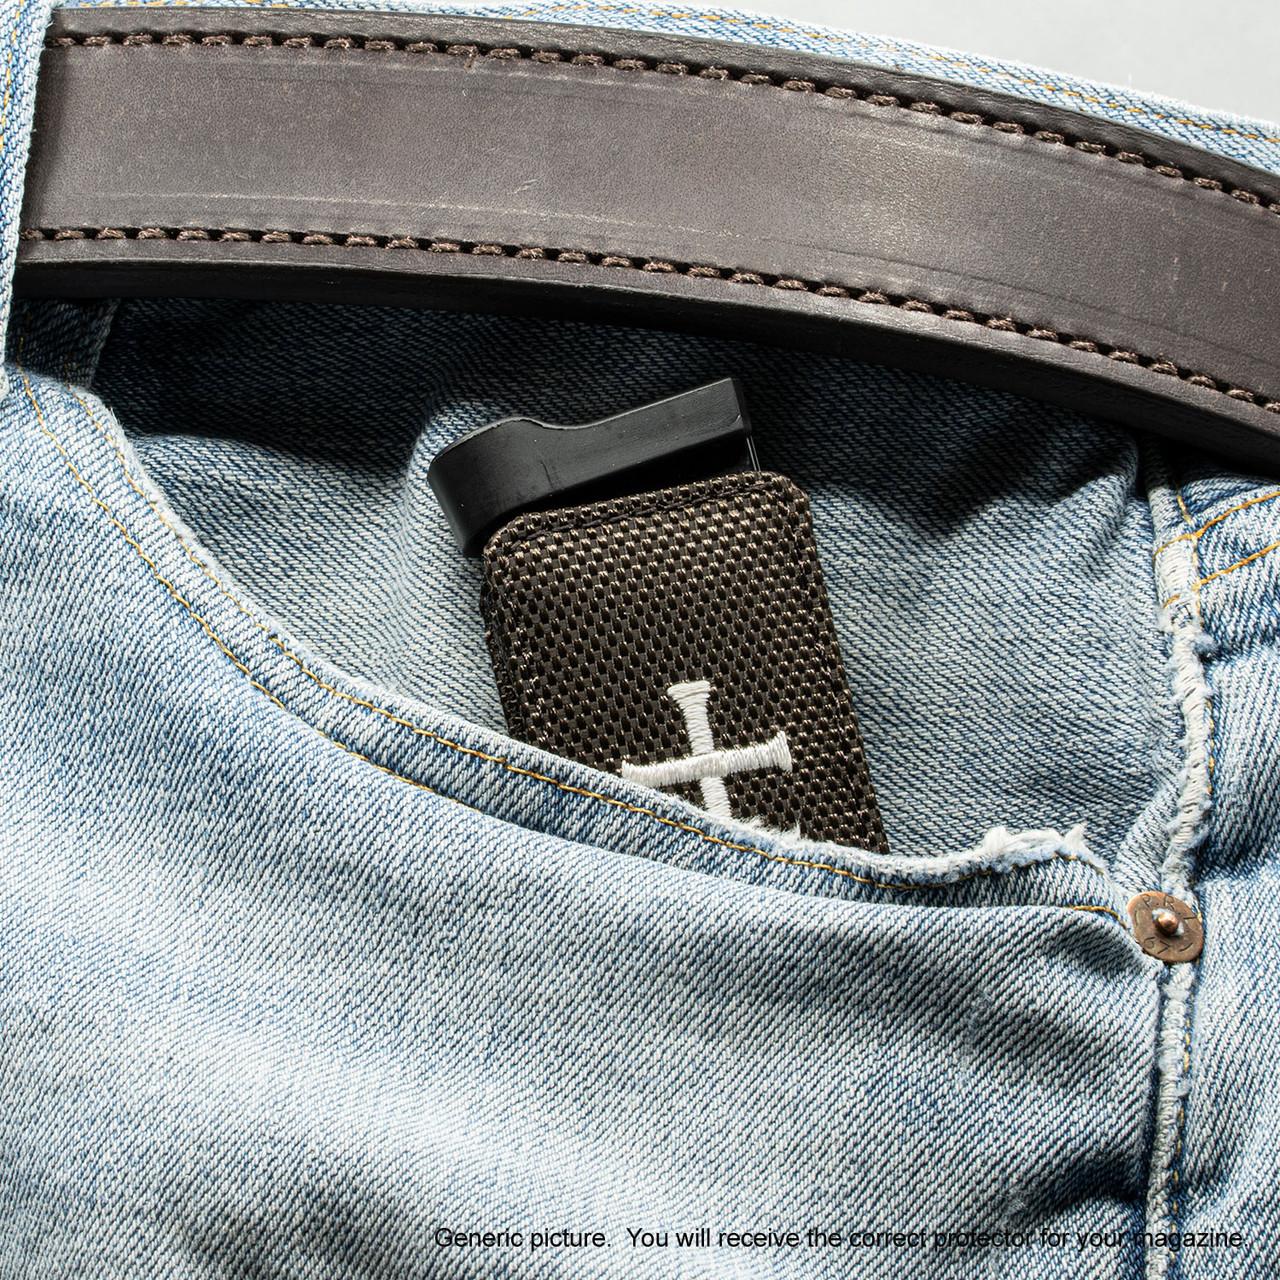 Beretta APX Brown Cross Magazine Pocket Protector